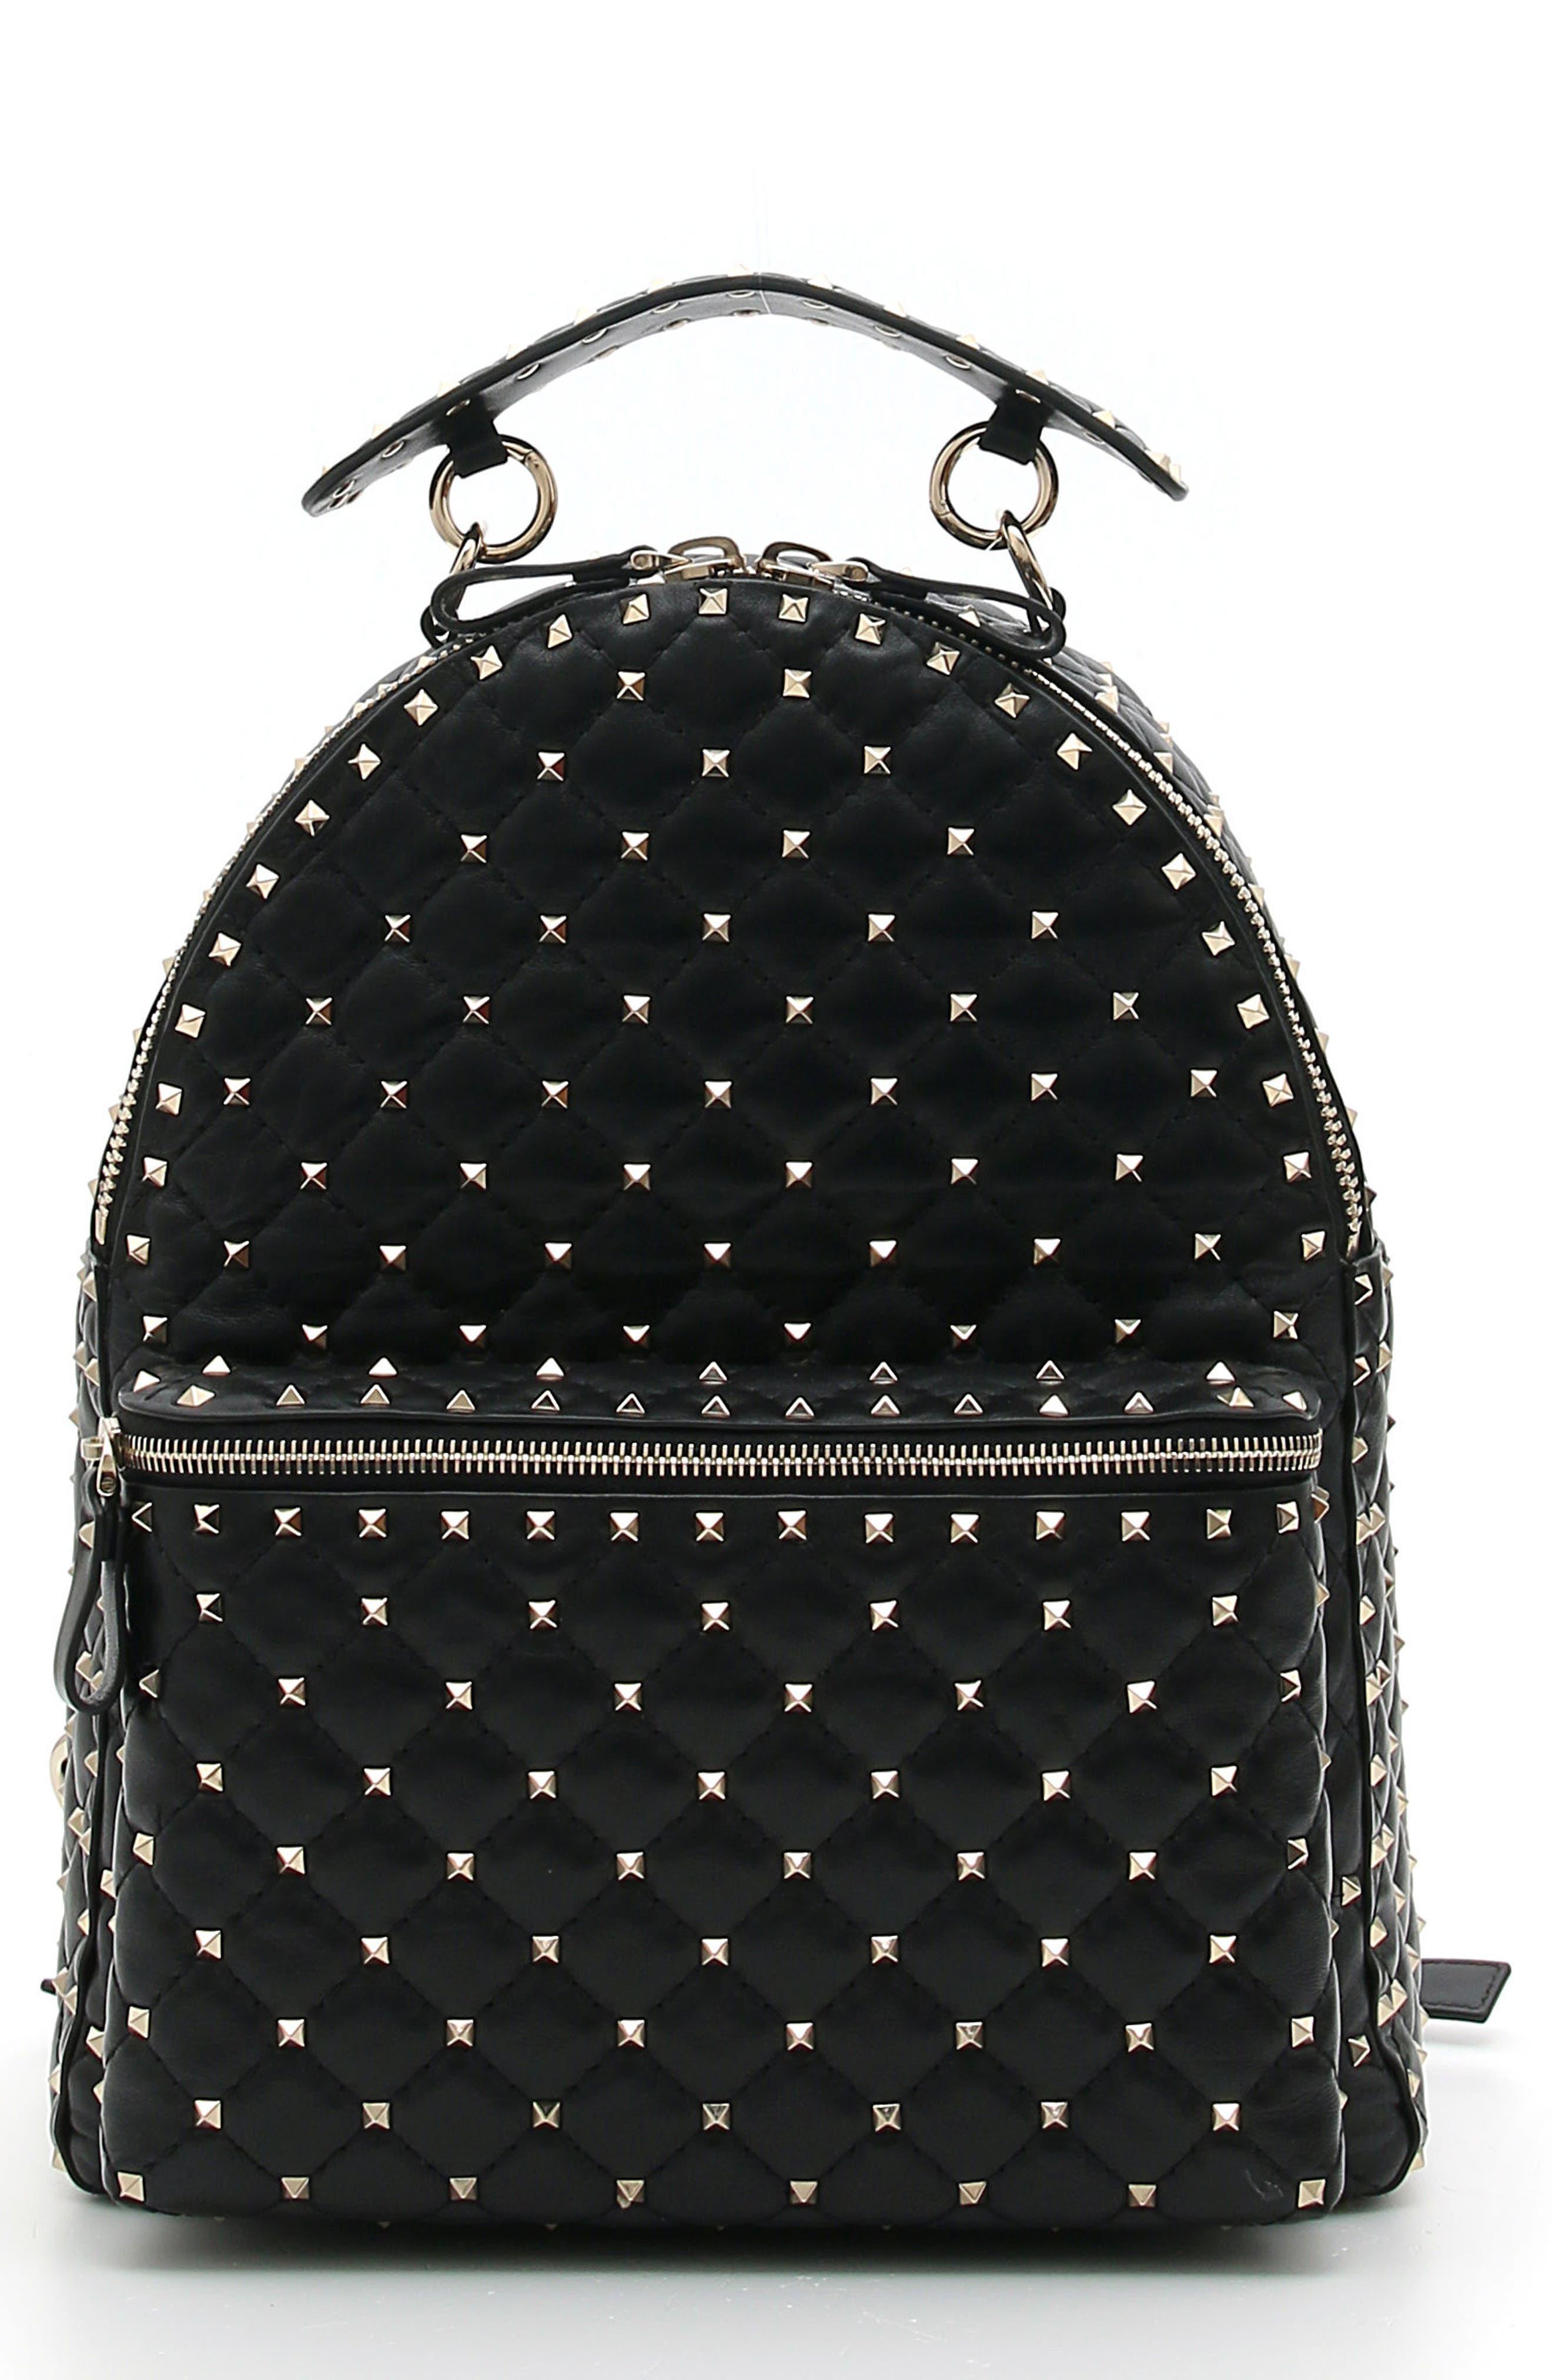 VALENTINO GARAVANI Rockstud Spike Quilted Leather Backpack